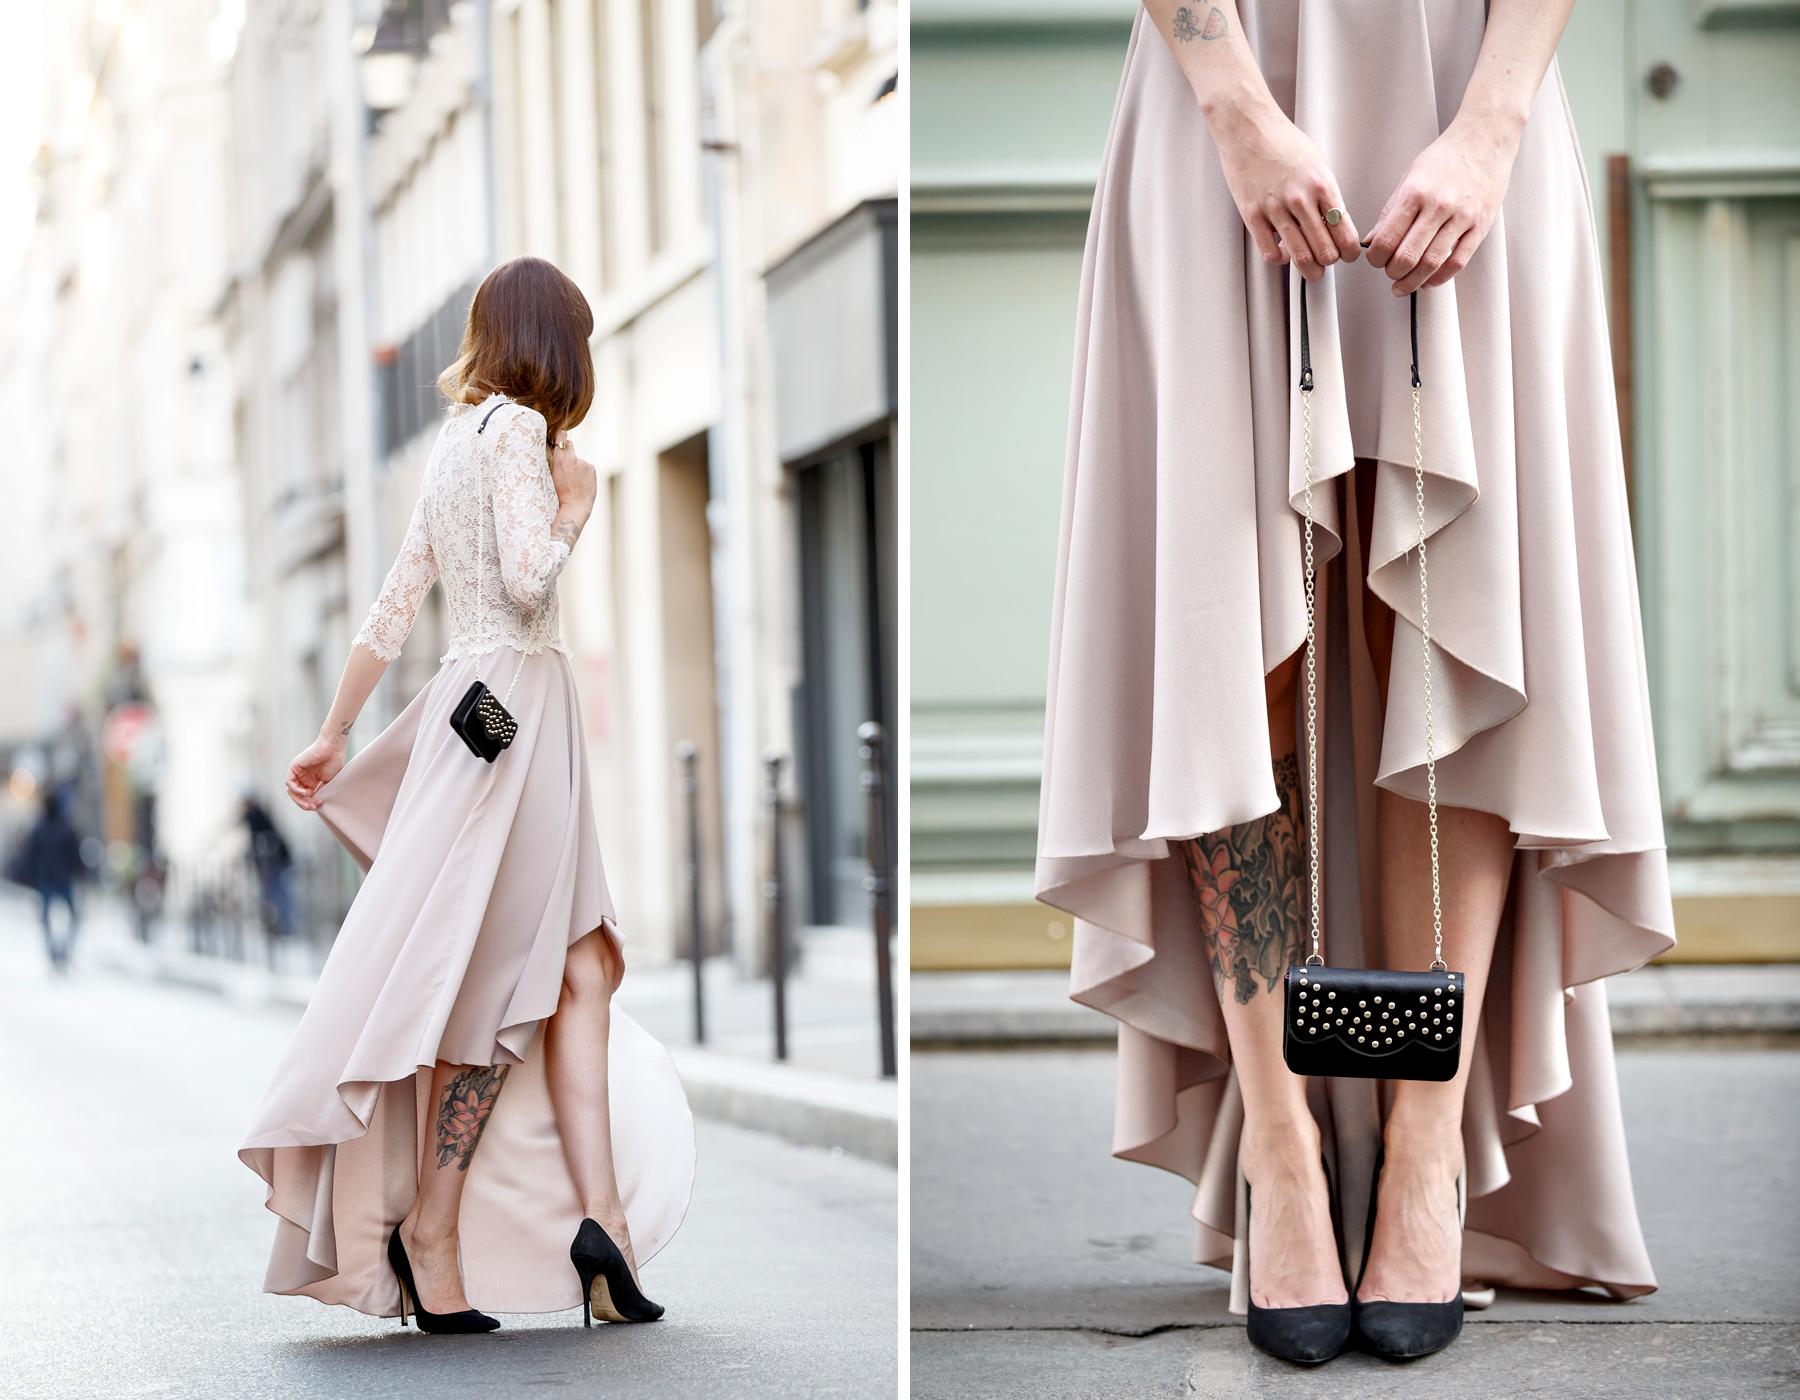 ewa herzog lace dress pastel rose paris le marais pfw fashion week ss16 ricarda schernus cats & dogs blog 6